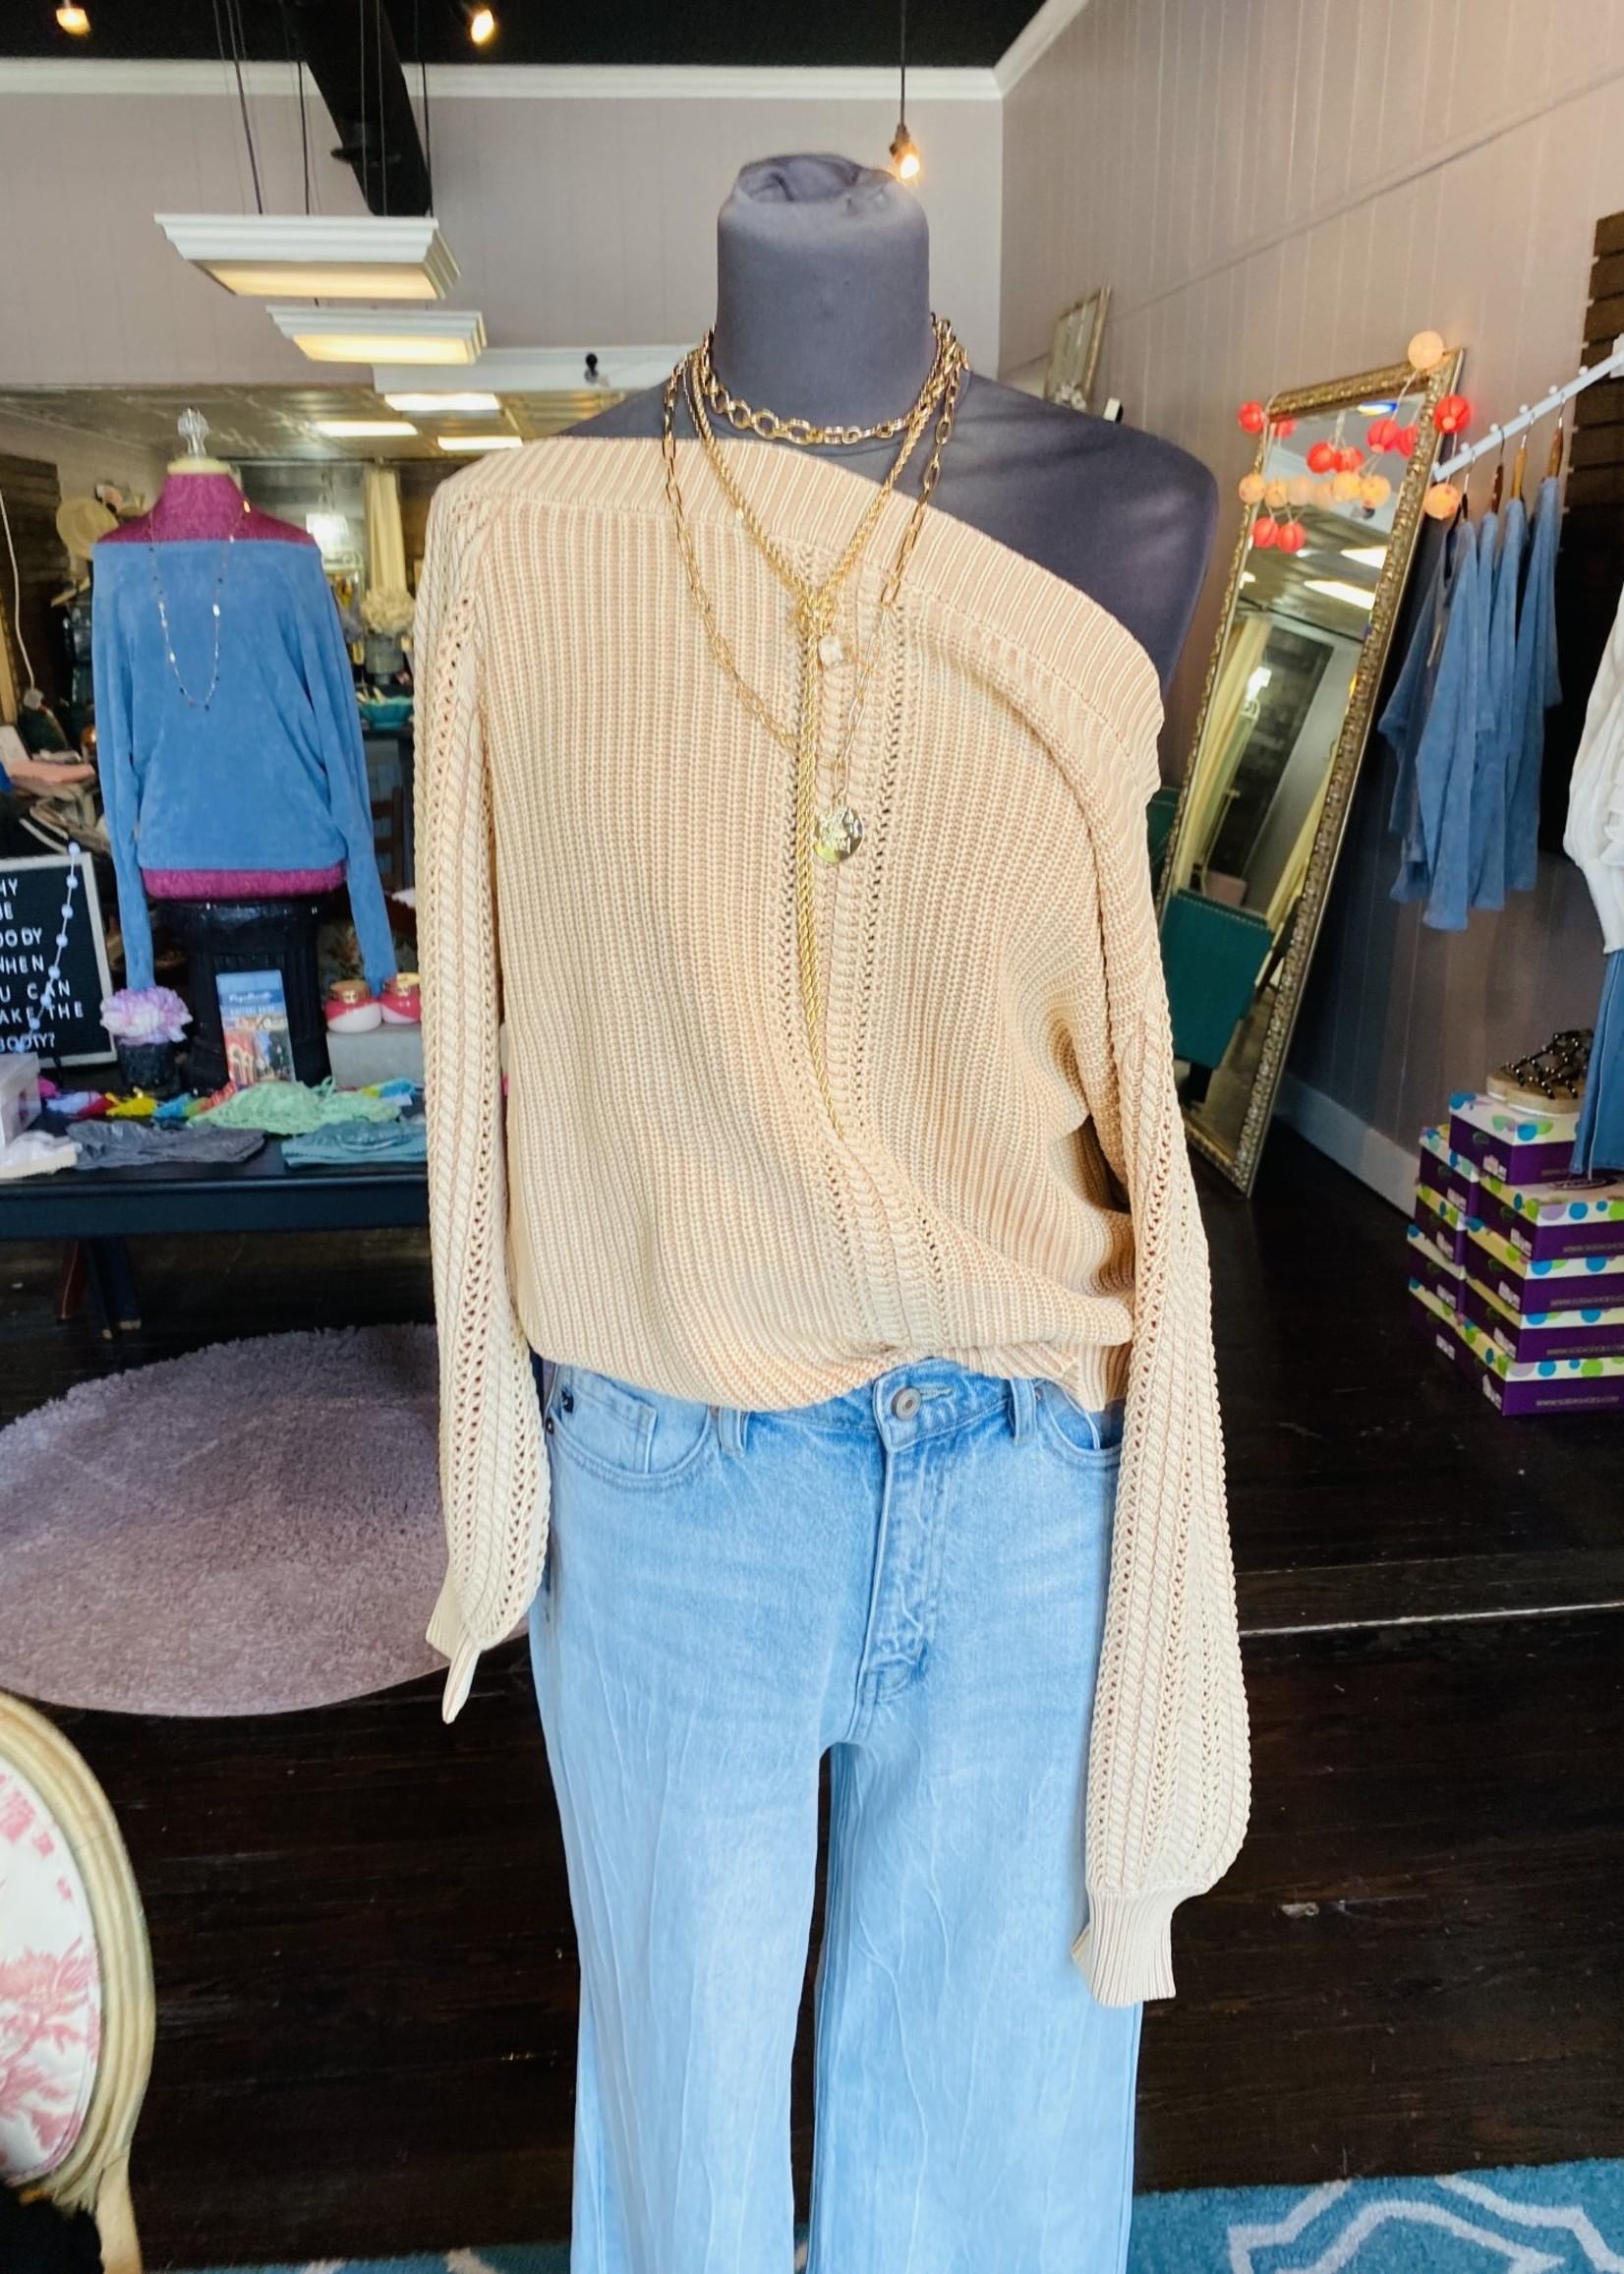 Off-shoulder cable knit top